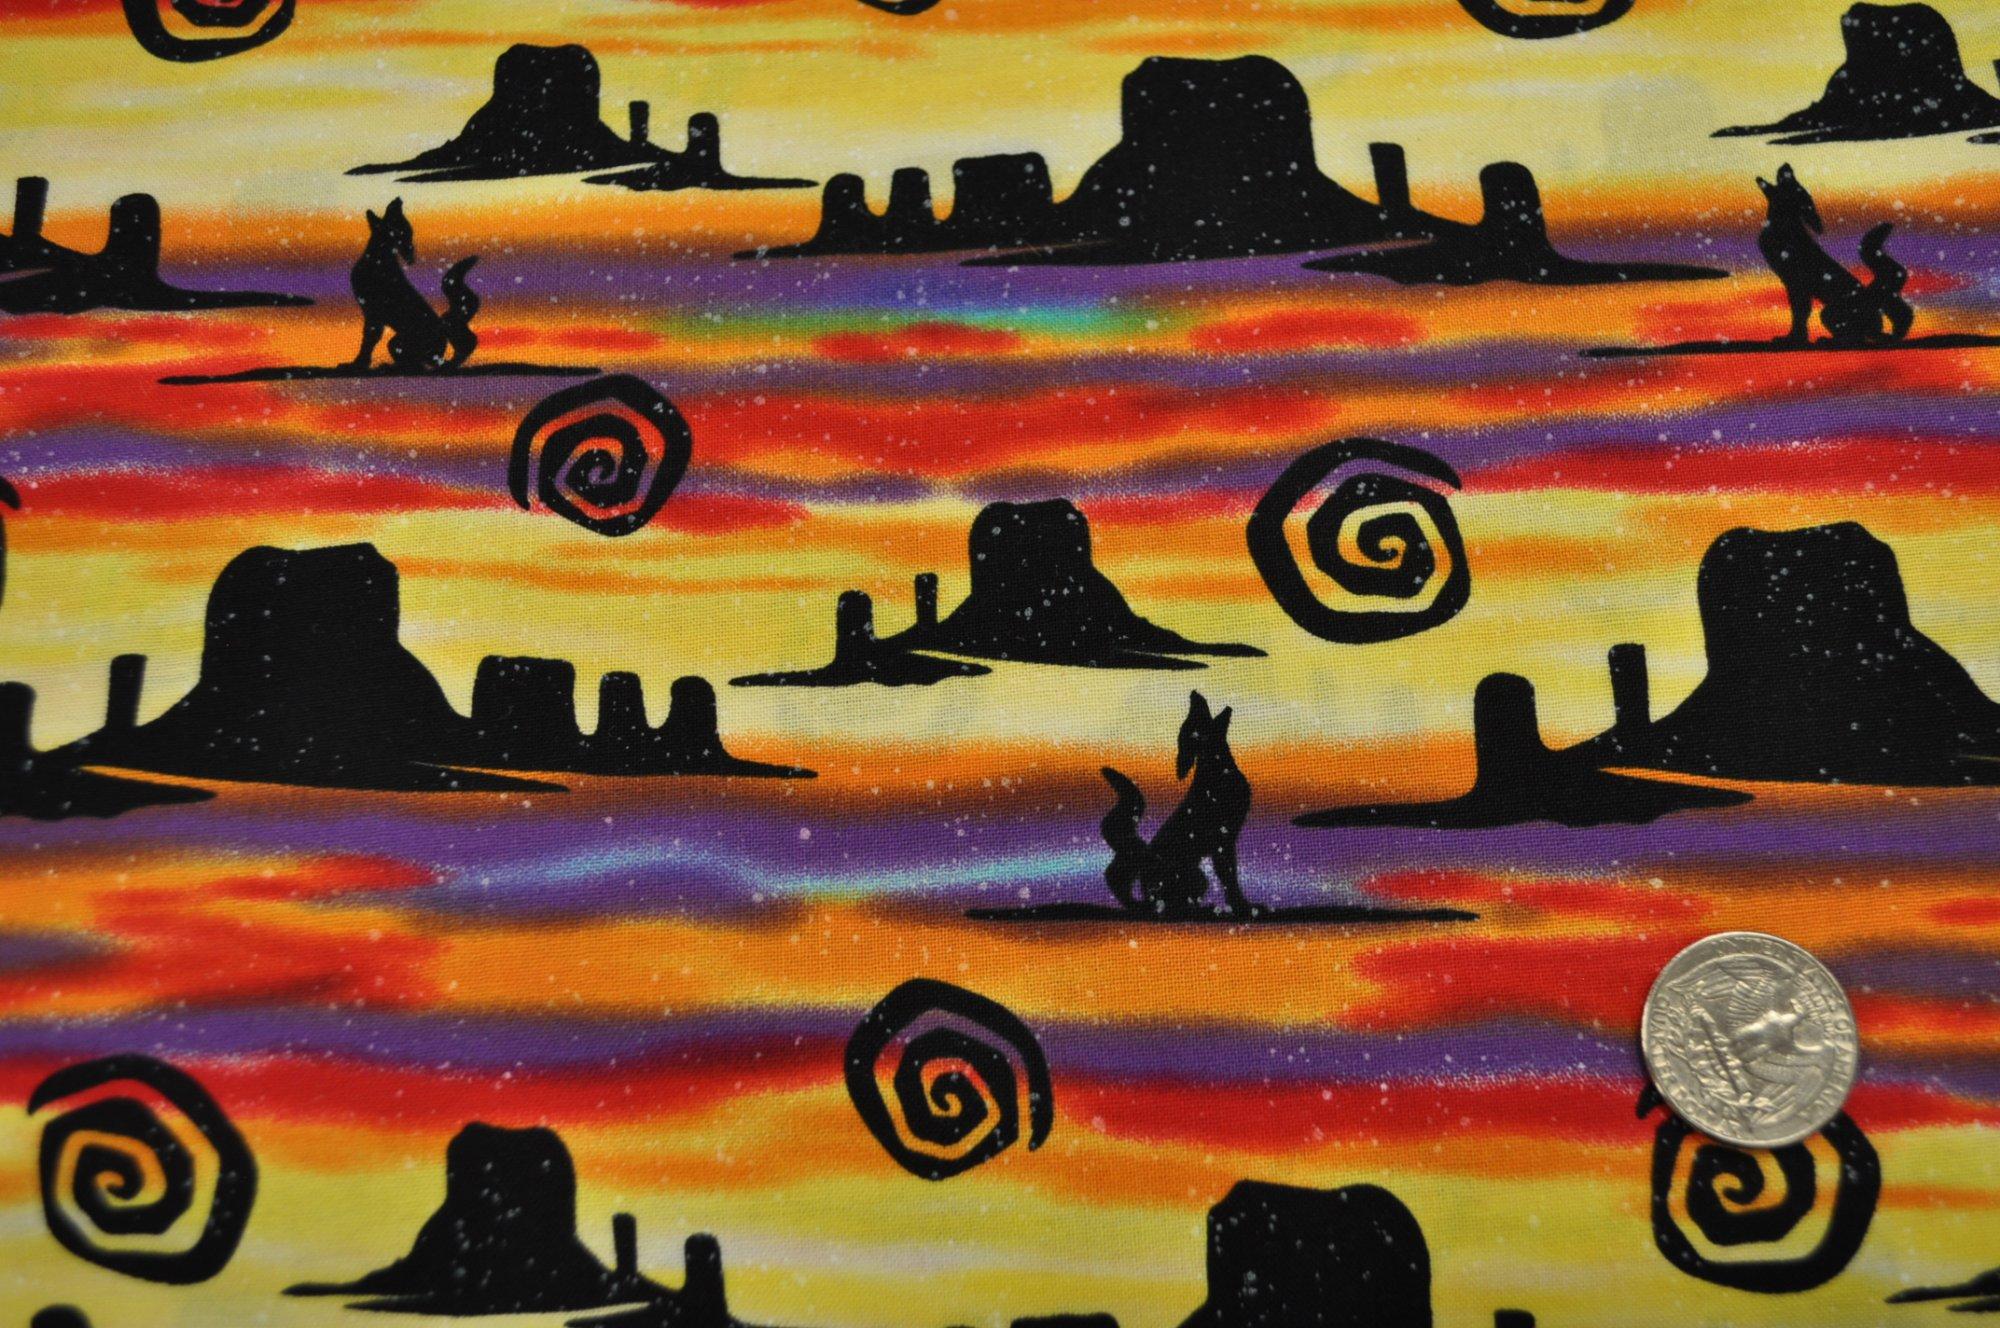 Kokopelli Desert Coyotes AWC-71201-206 Sunset